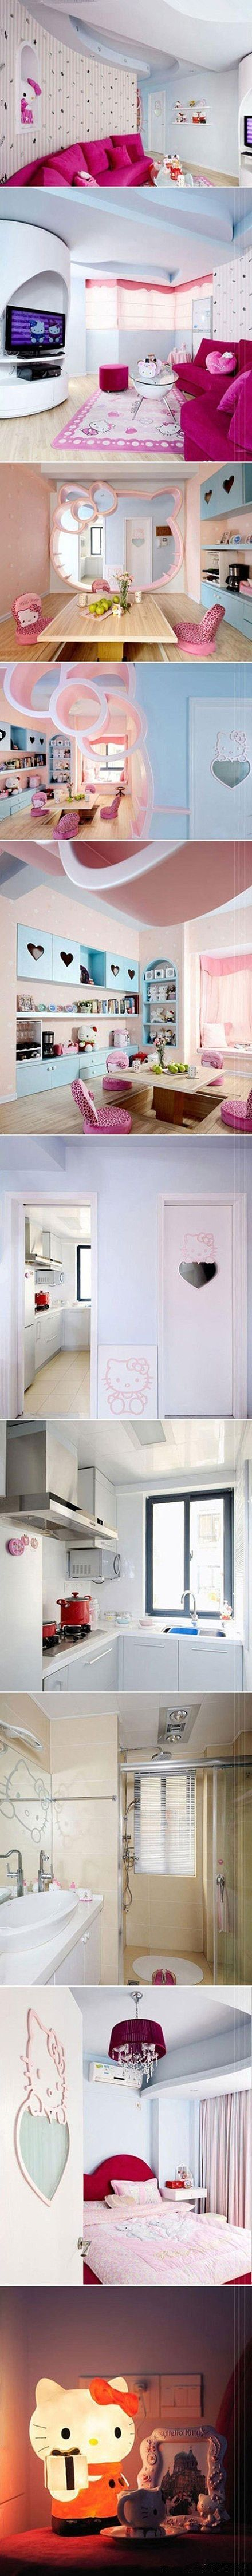 Hello kitty bedroom ireland - How Fun Would A Hello Kitty Themed House Be